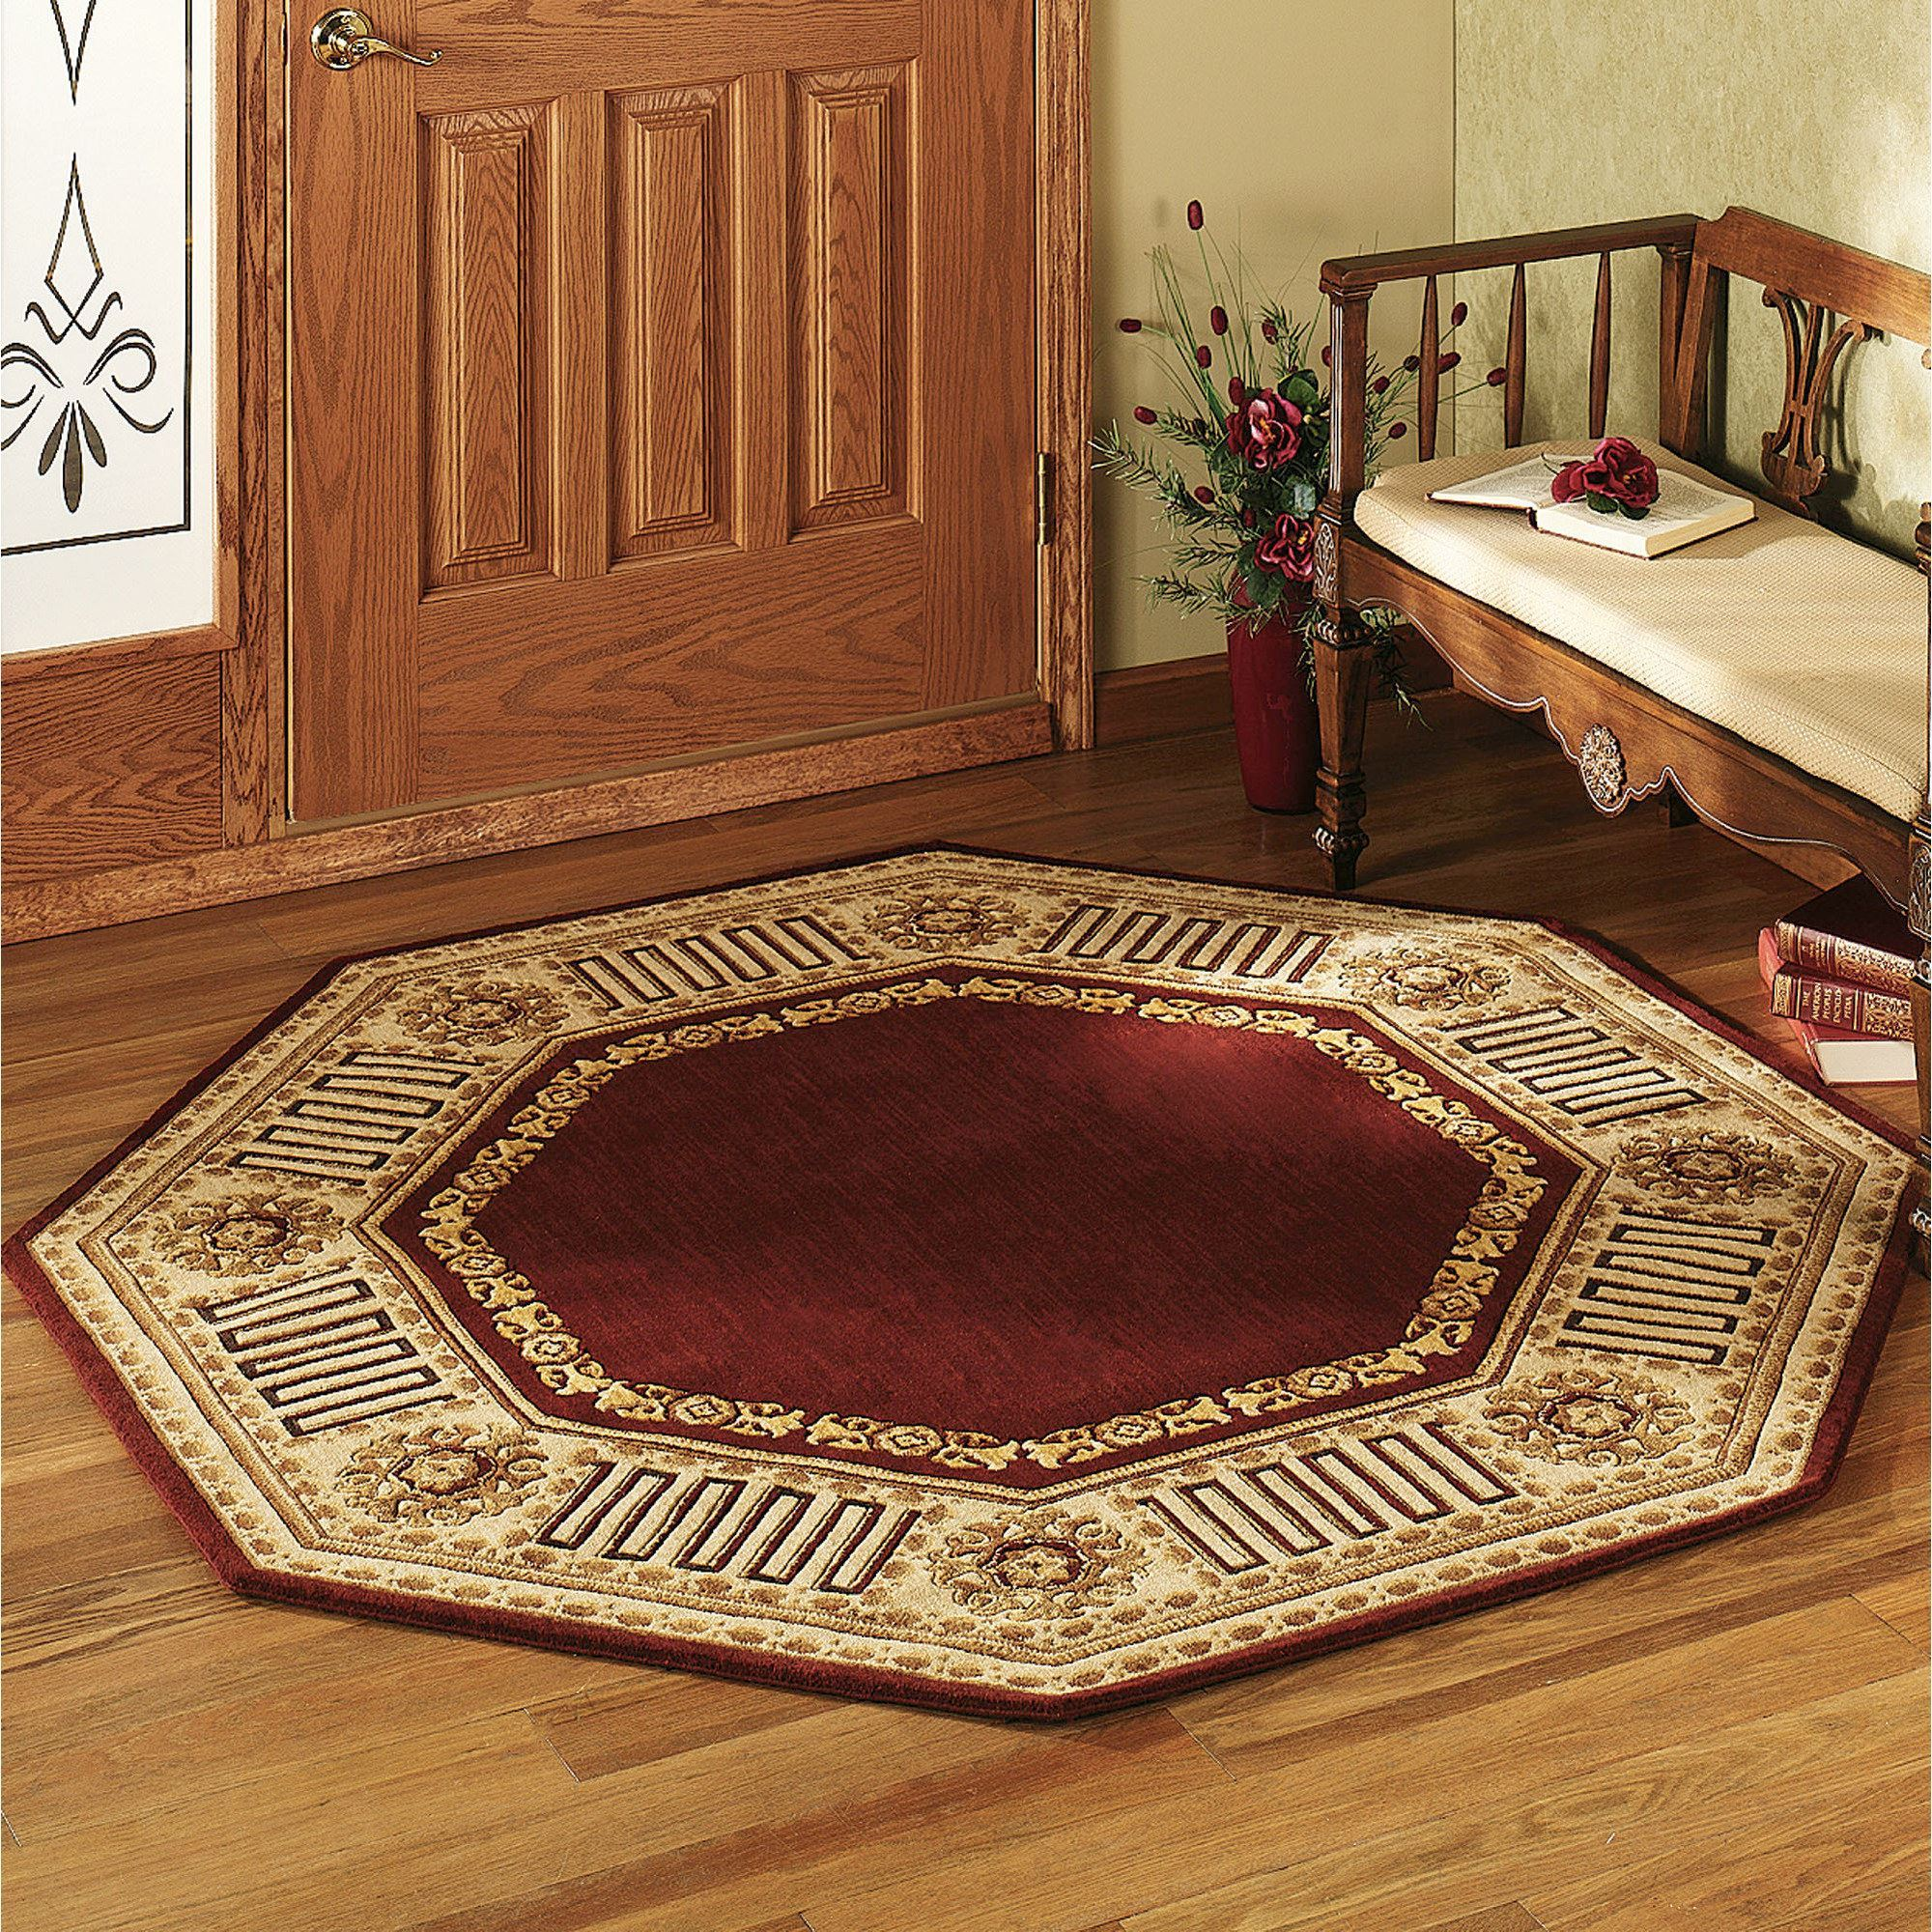 octagon rugs greek key octagonal rug UBUQEUP